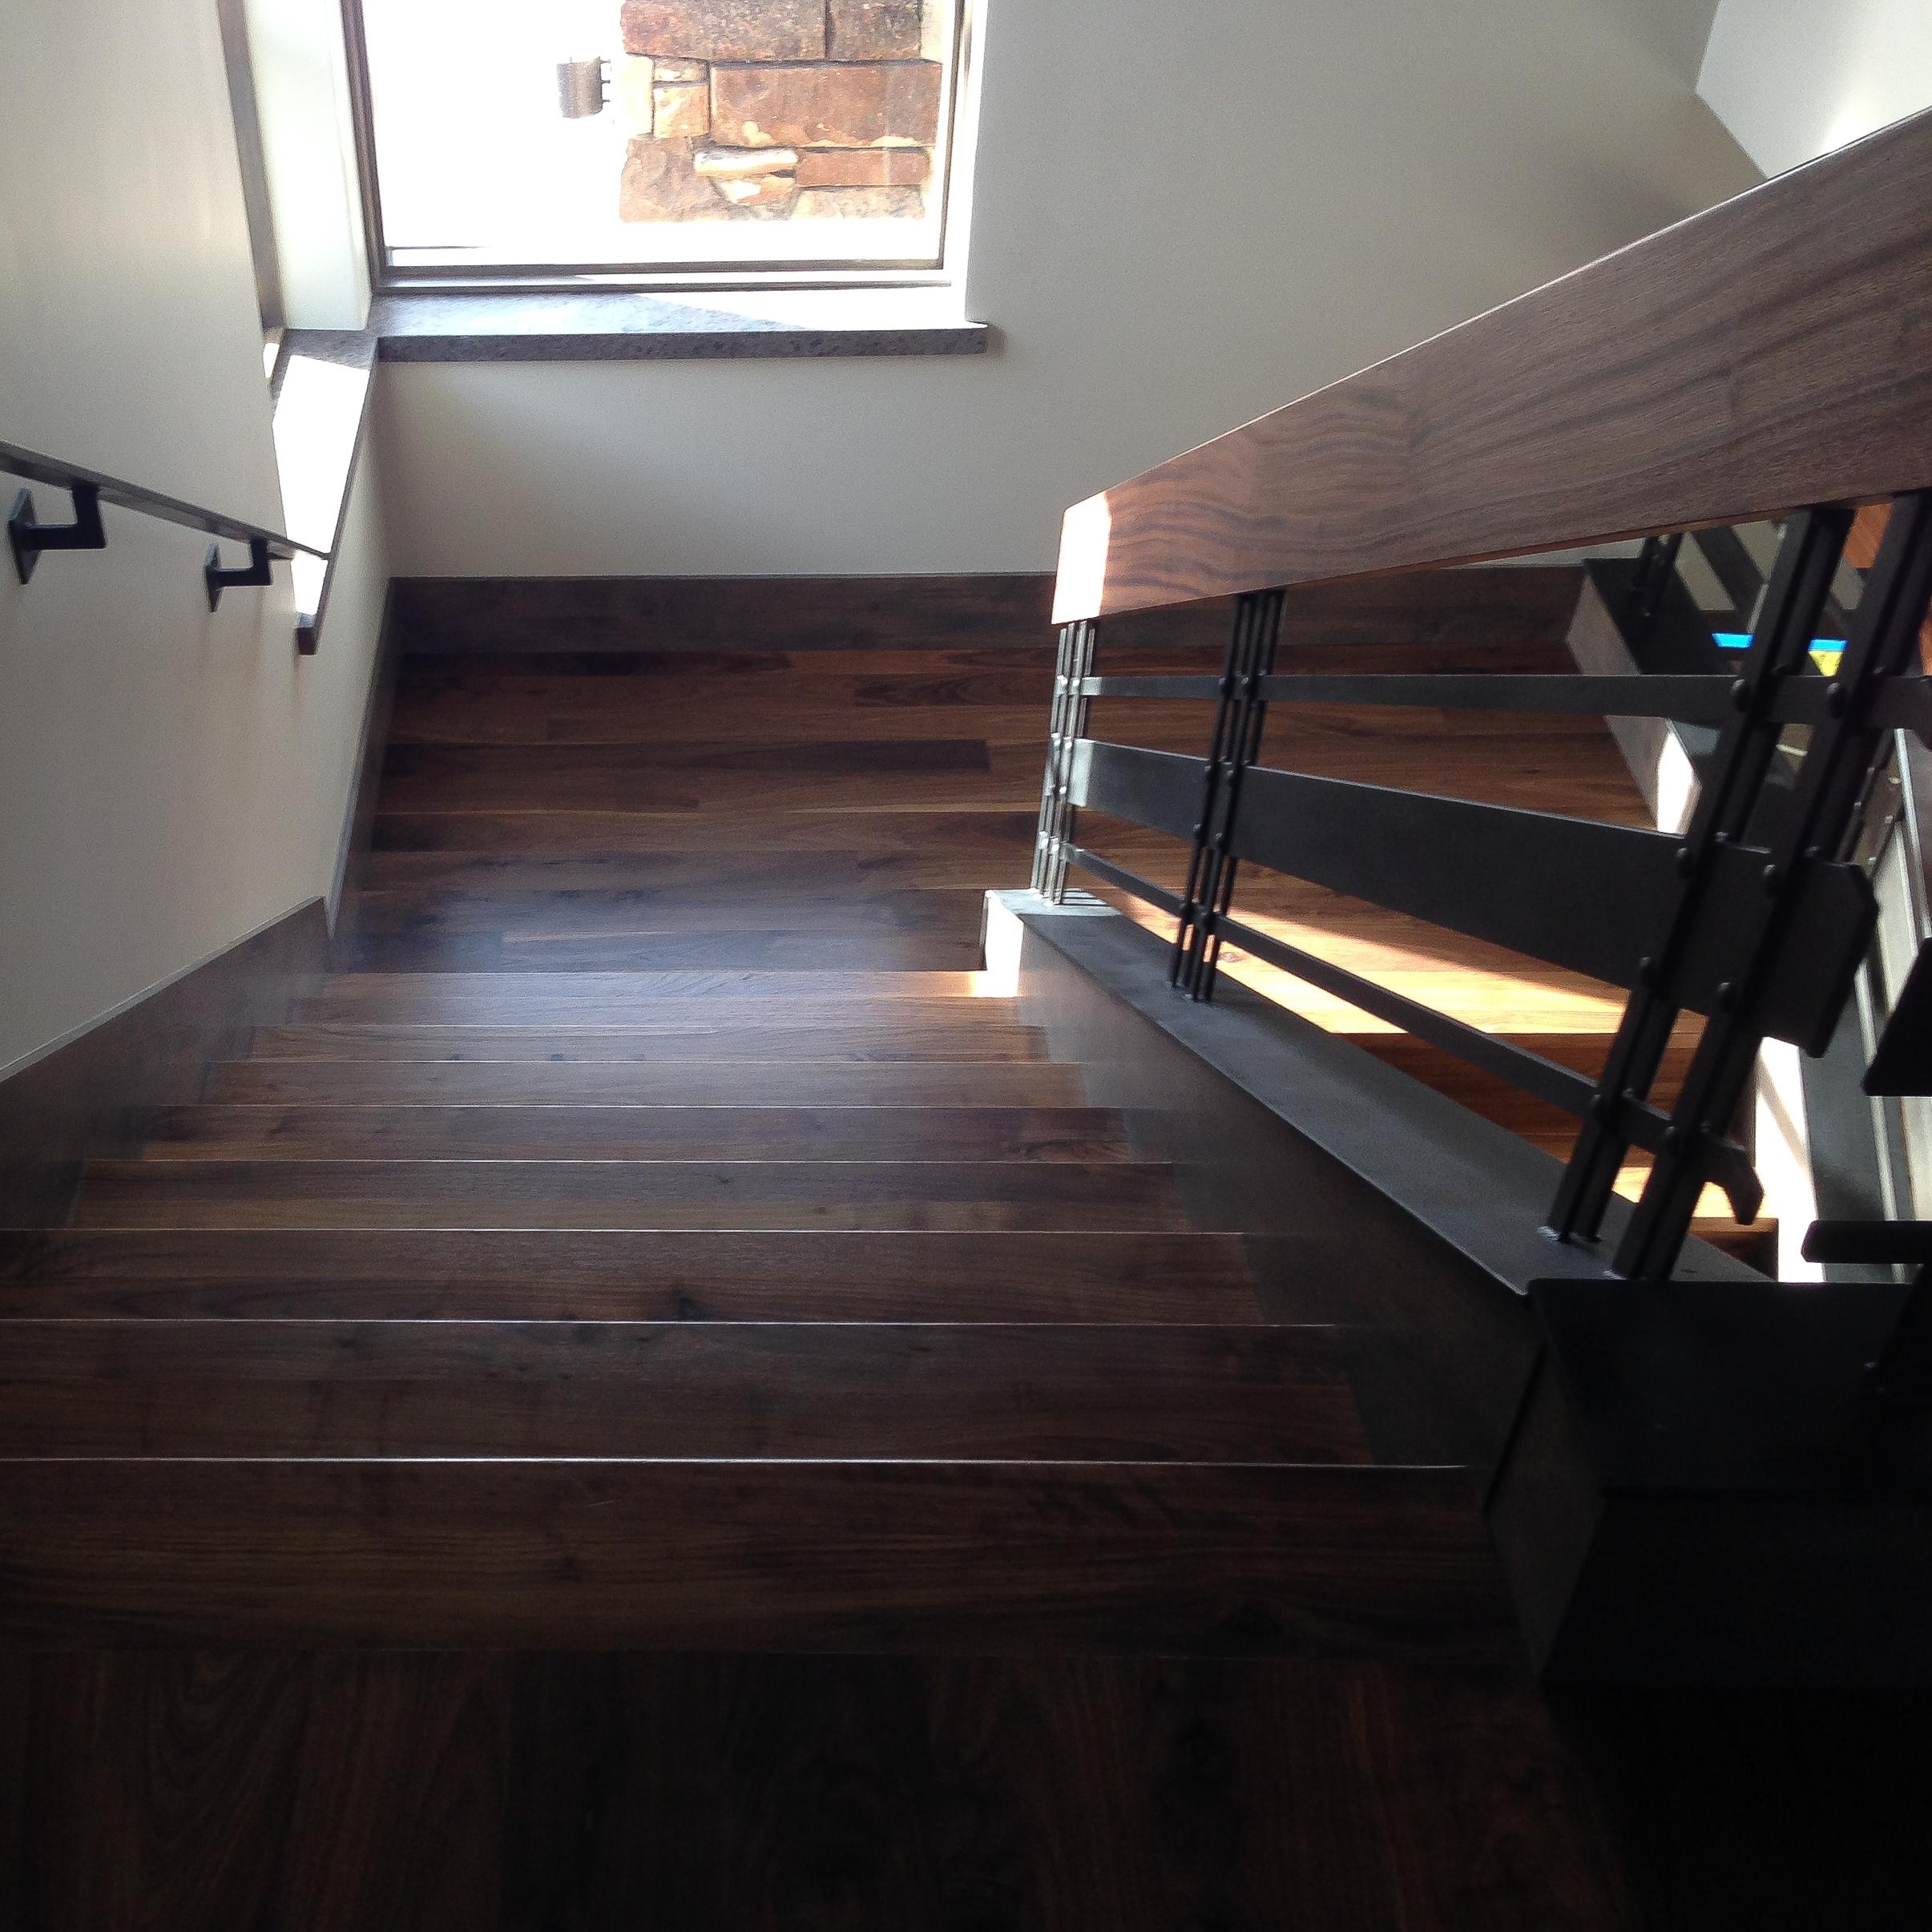 Staircase-13.jpg